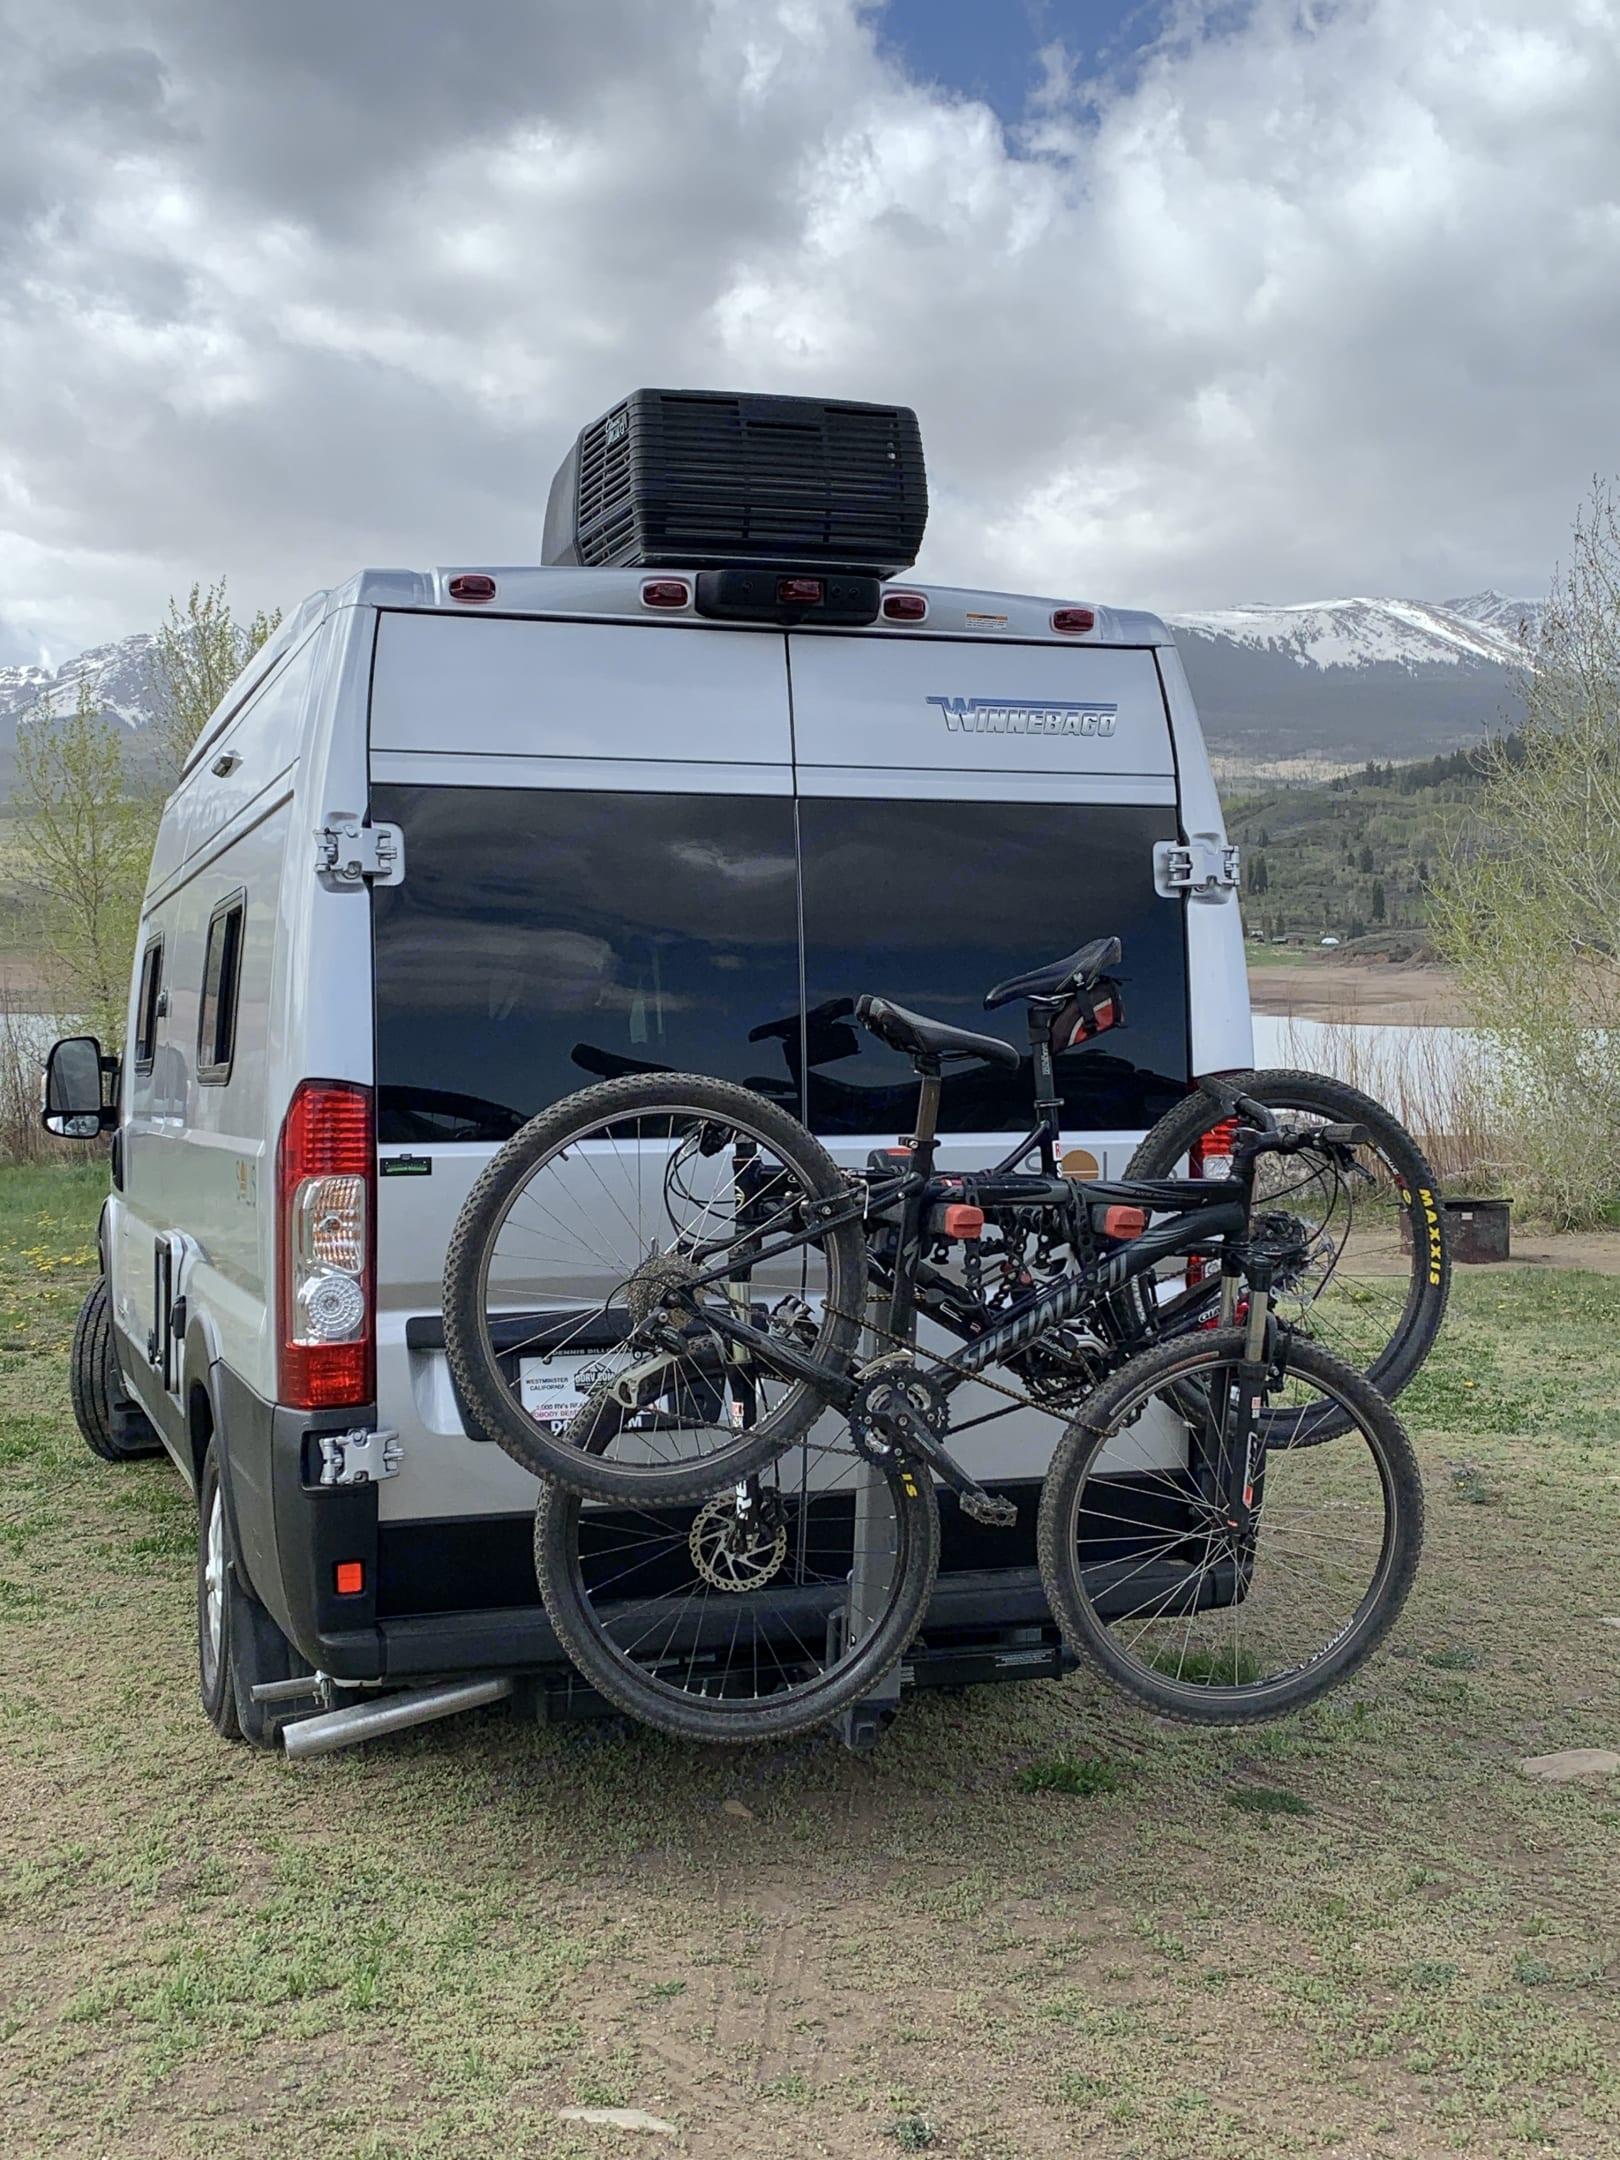 Easily add a bike rack. Winnebago Solis 59PX 2022